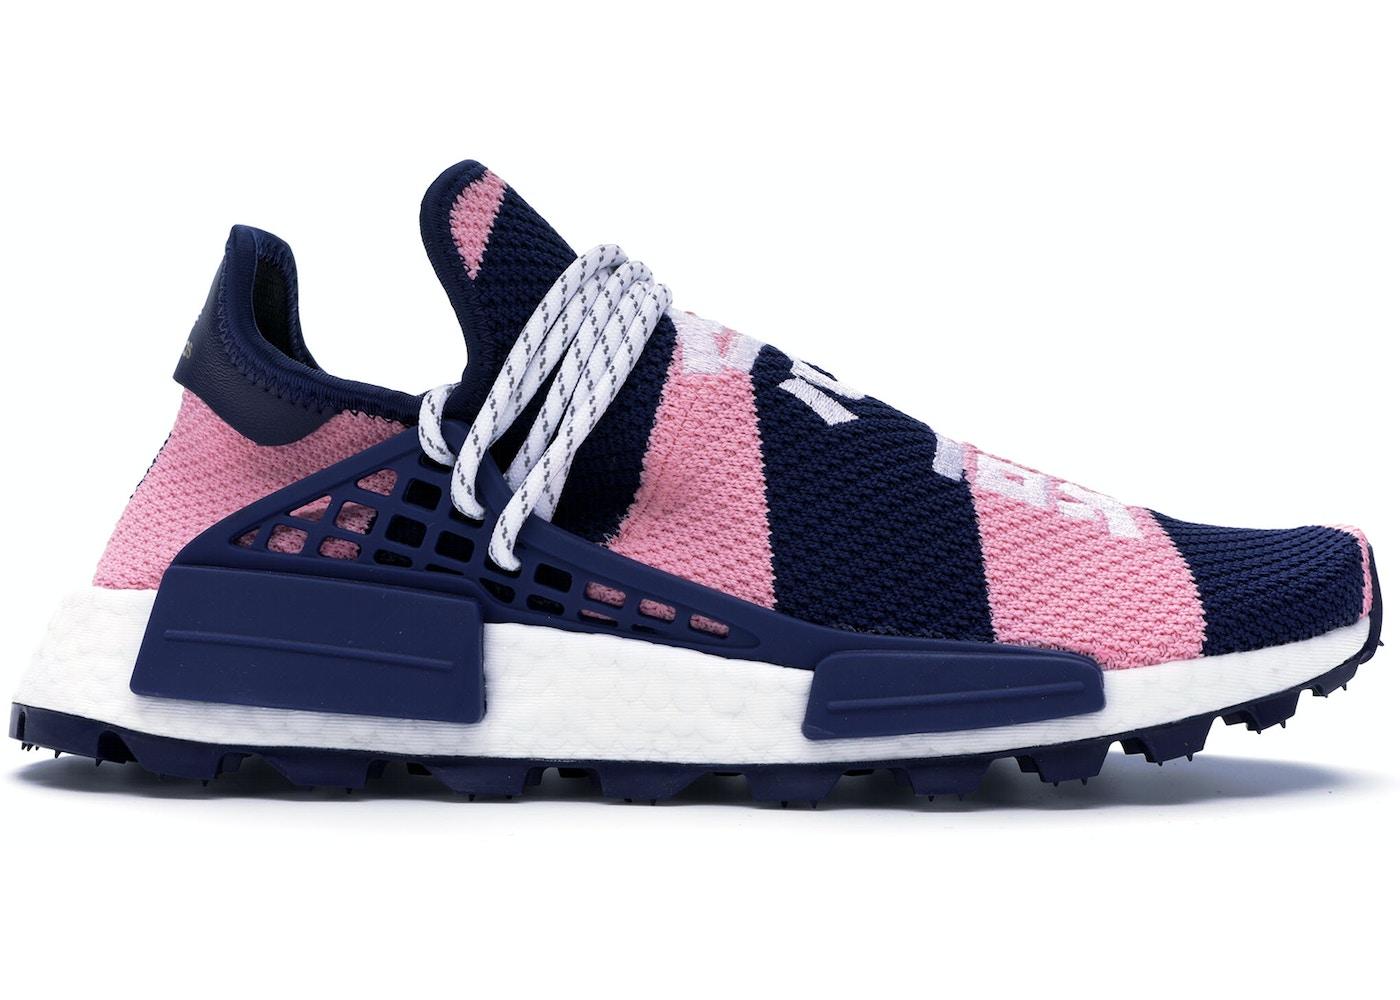 25144a9567231a adidas NMD Hu Pharrell x Billionaire Boys Club Navy Pink - G26277